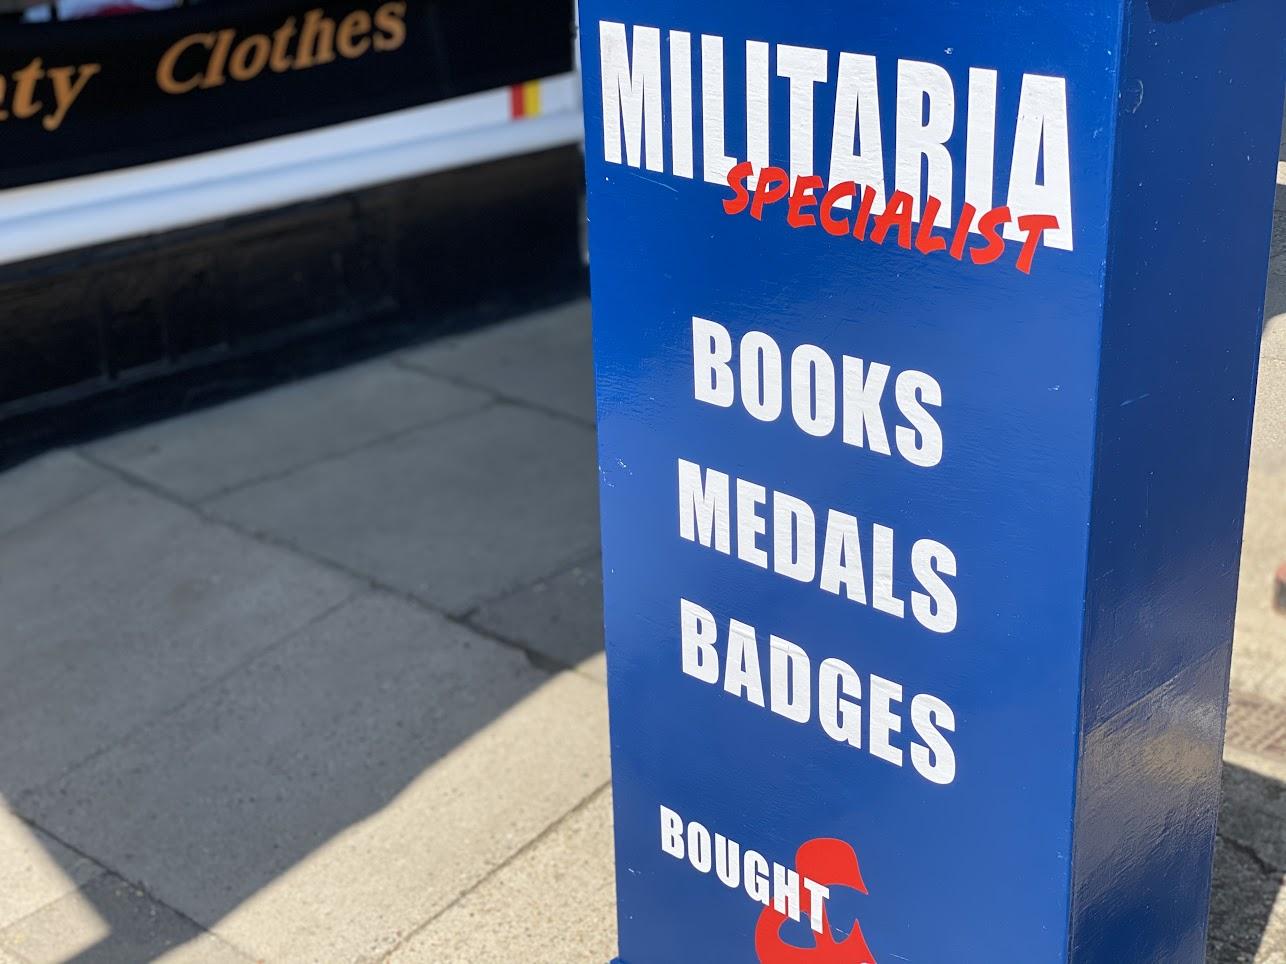 Cinque Ports Militaria Tenterden